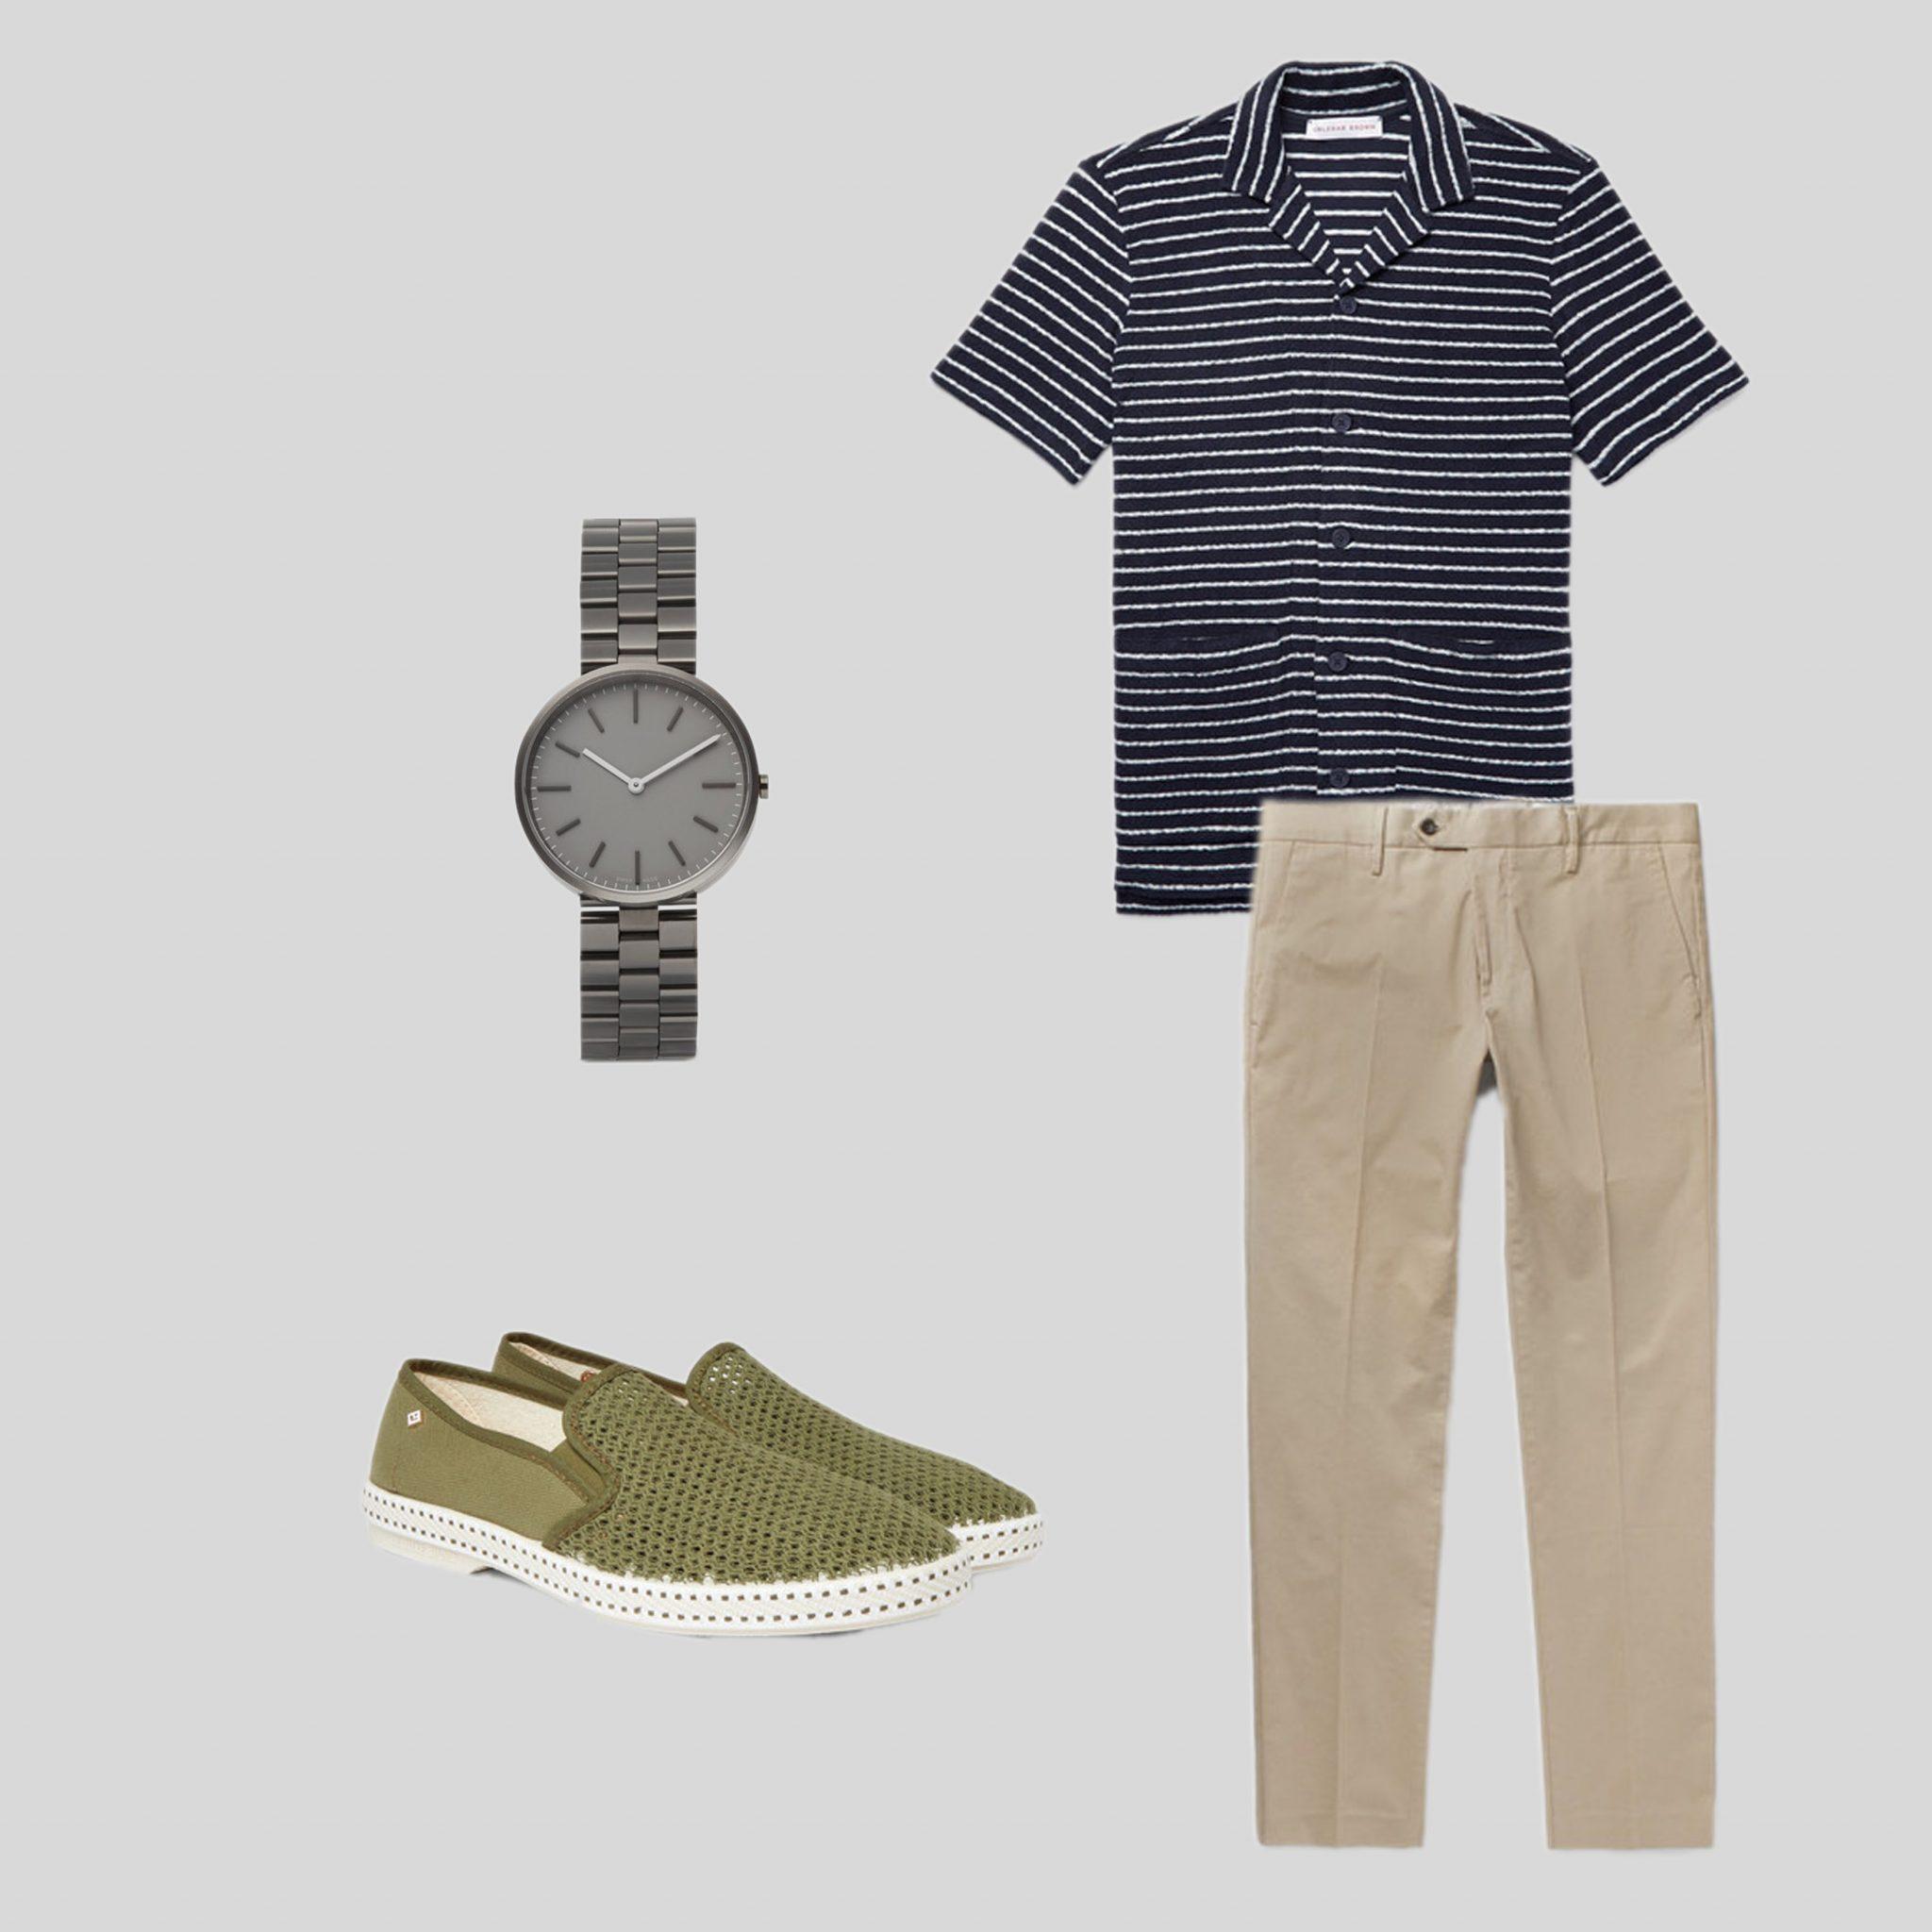 ELLE Man Style Calendar mix & match trang phục du lịch biển. (17)